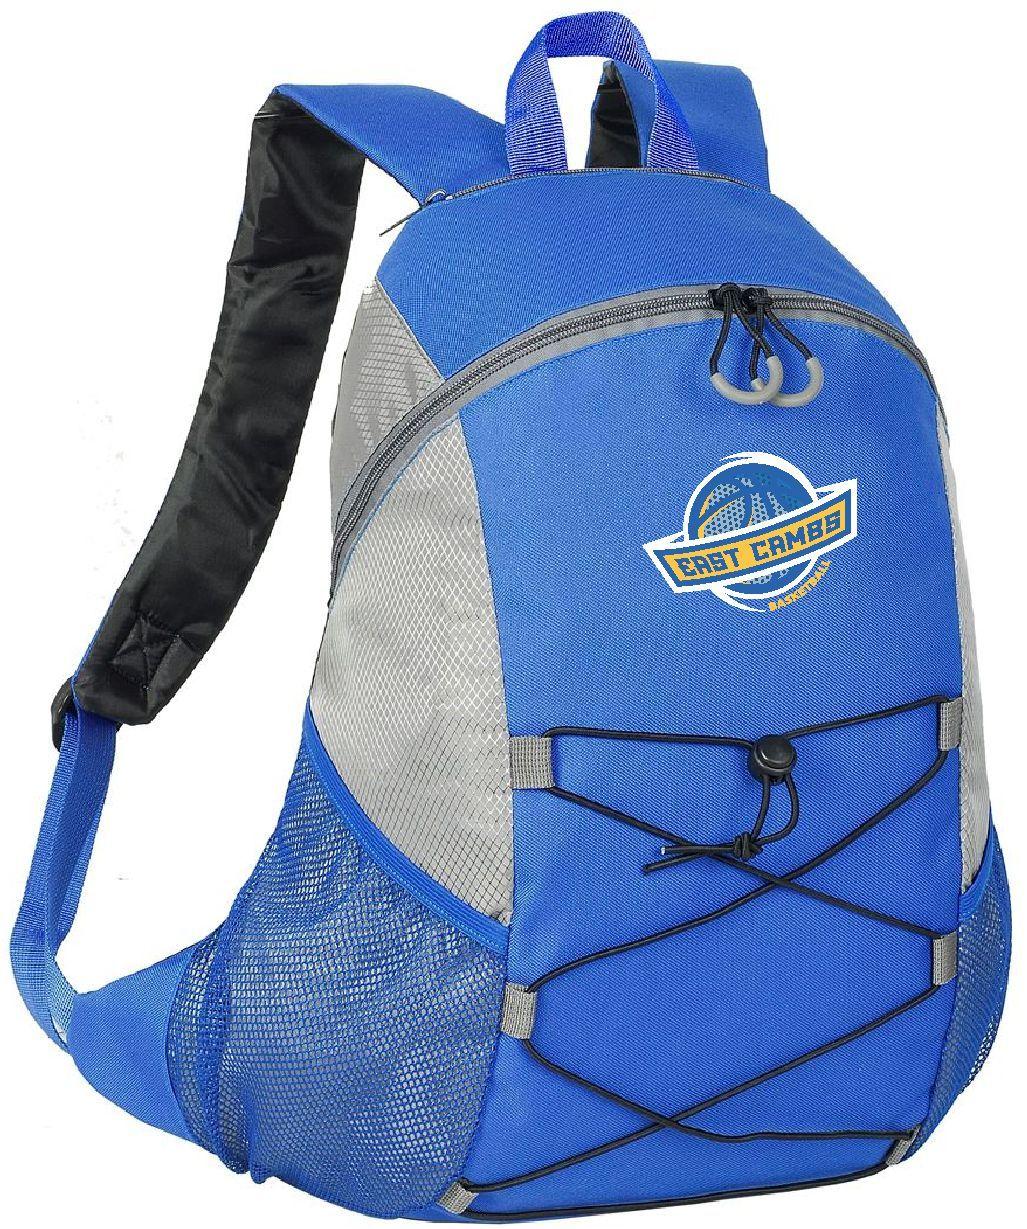 Warriors - Backpack (Royal Blue/Grey)